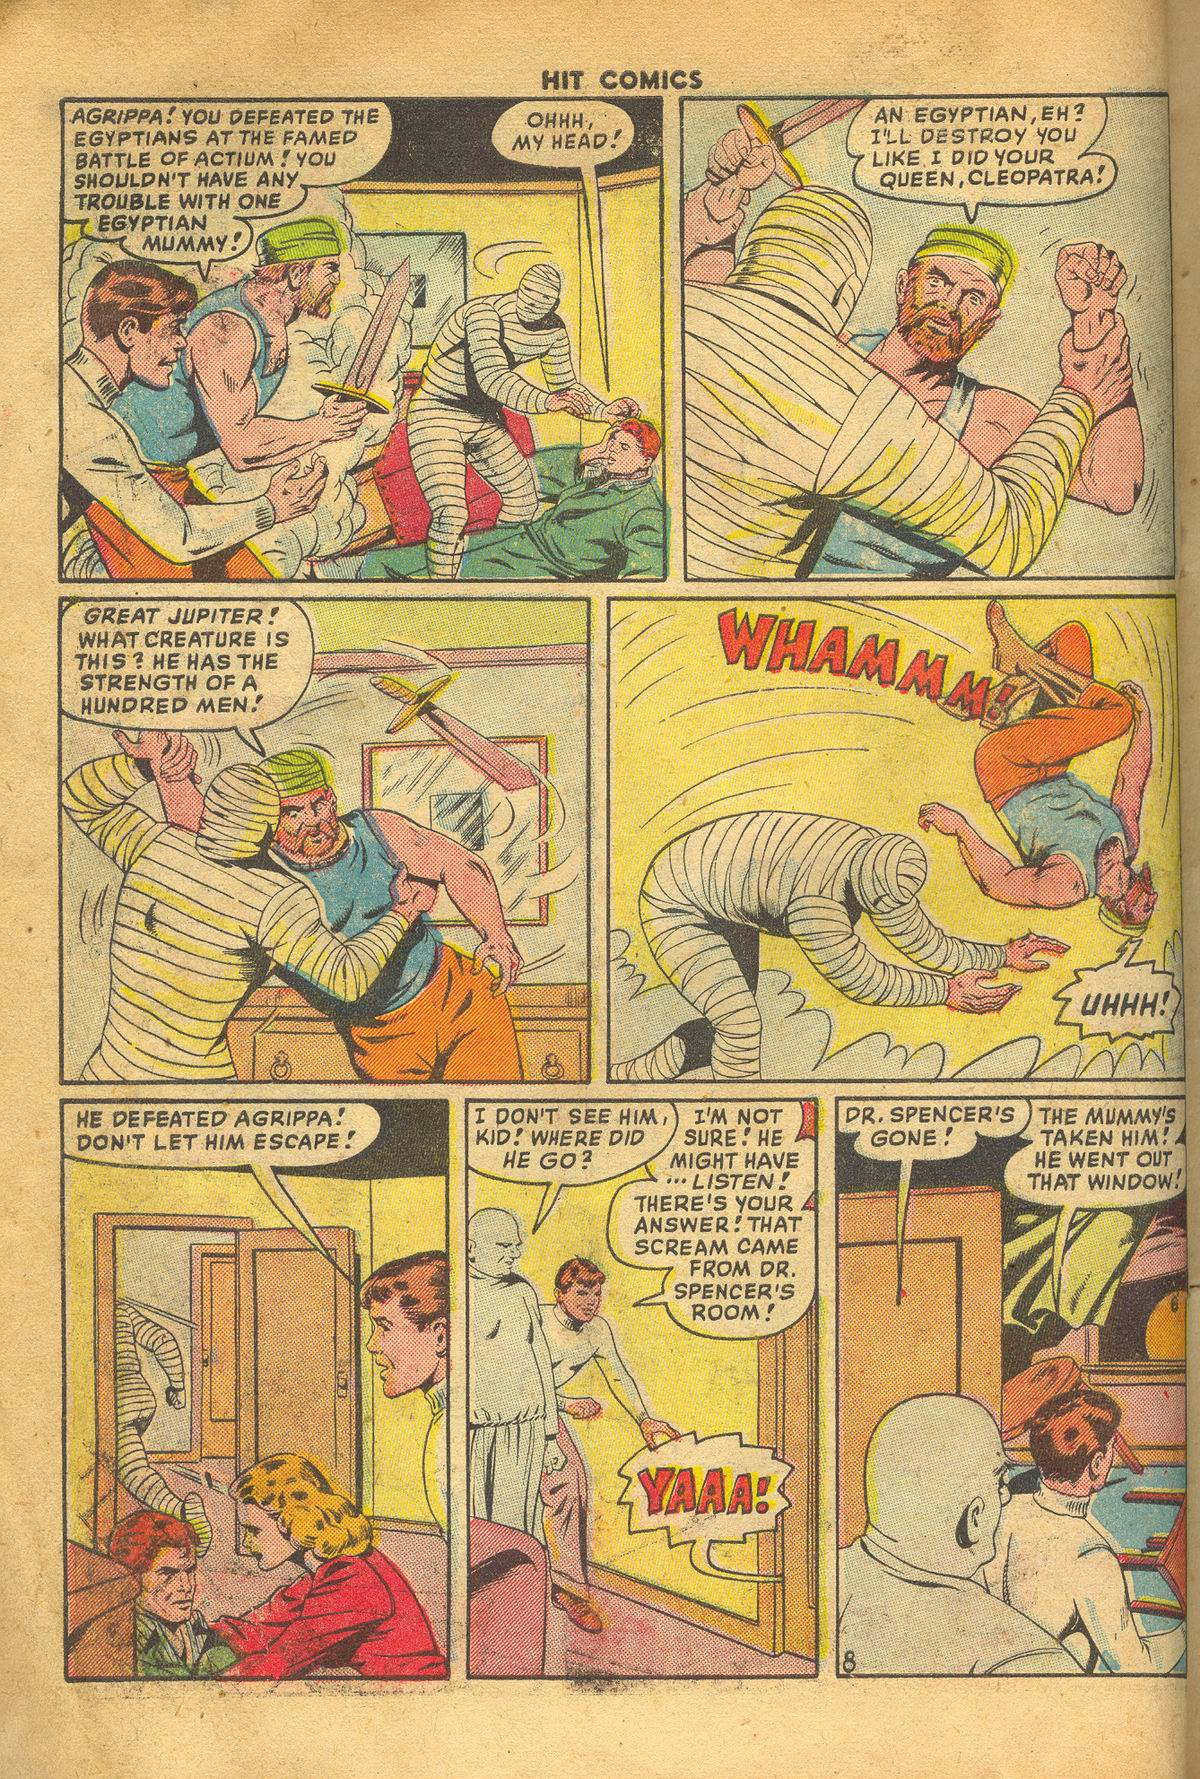 Read online Hit Comics comic -  Issue #60 - 10